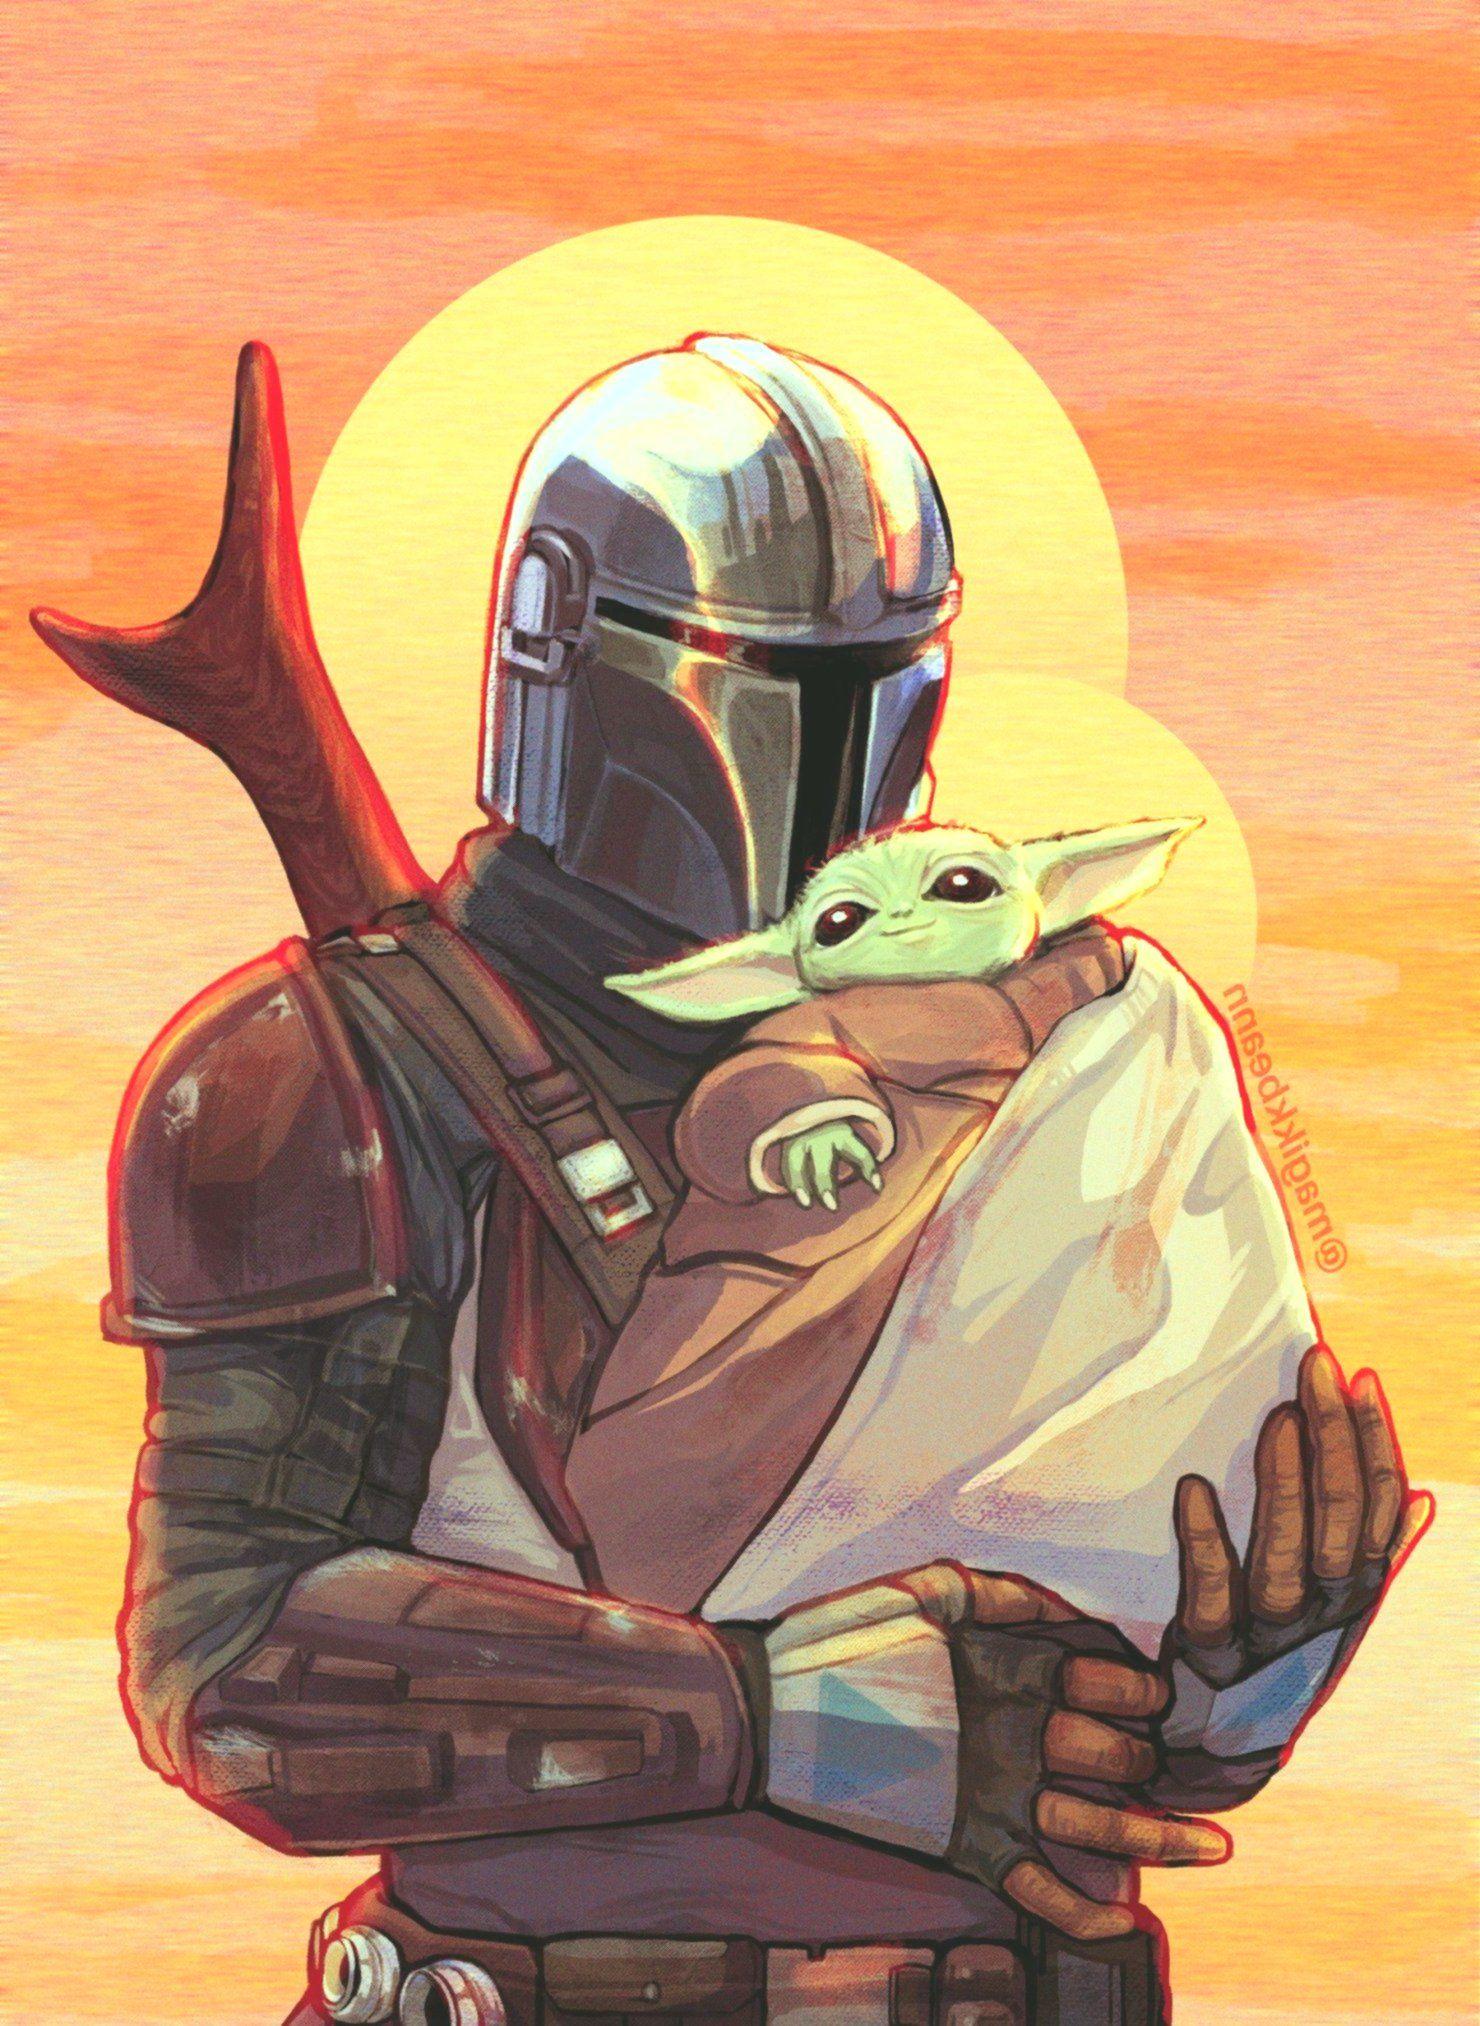 17 Beautiful Baby Yoda Wallpapers Yoda Wallpaper Star Wars Wallpaper Star Wars Art